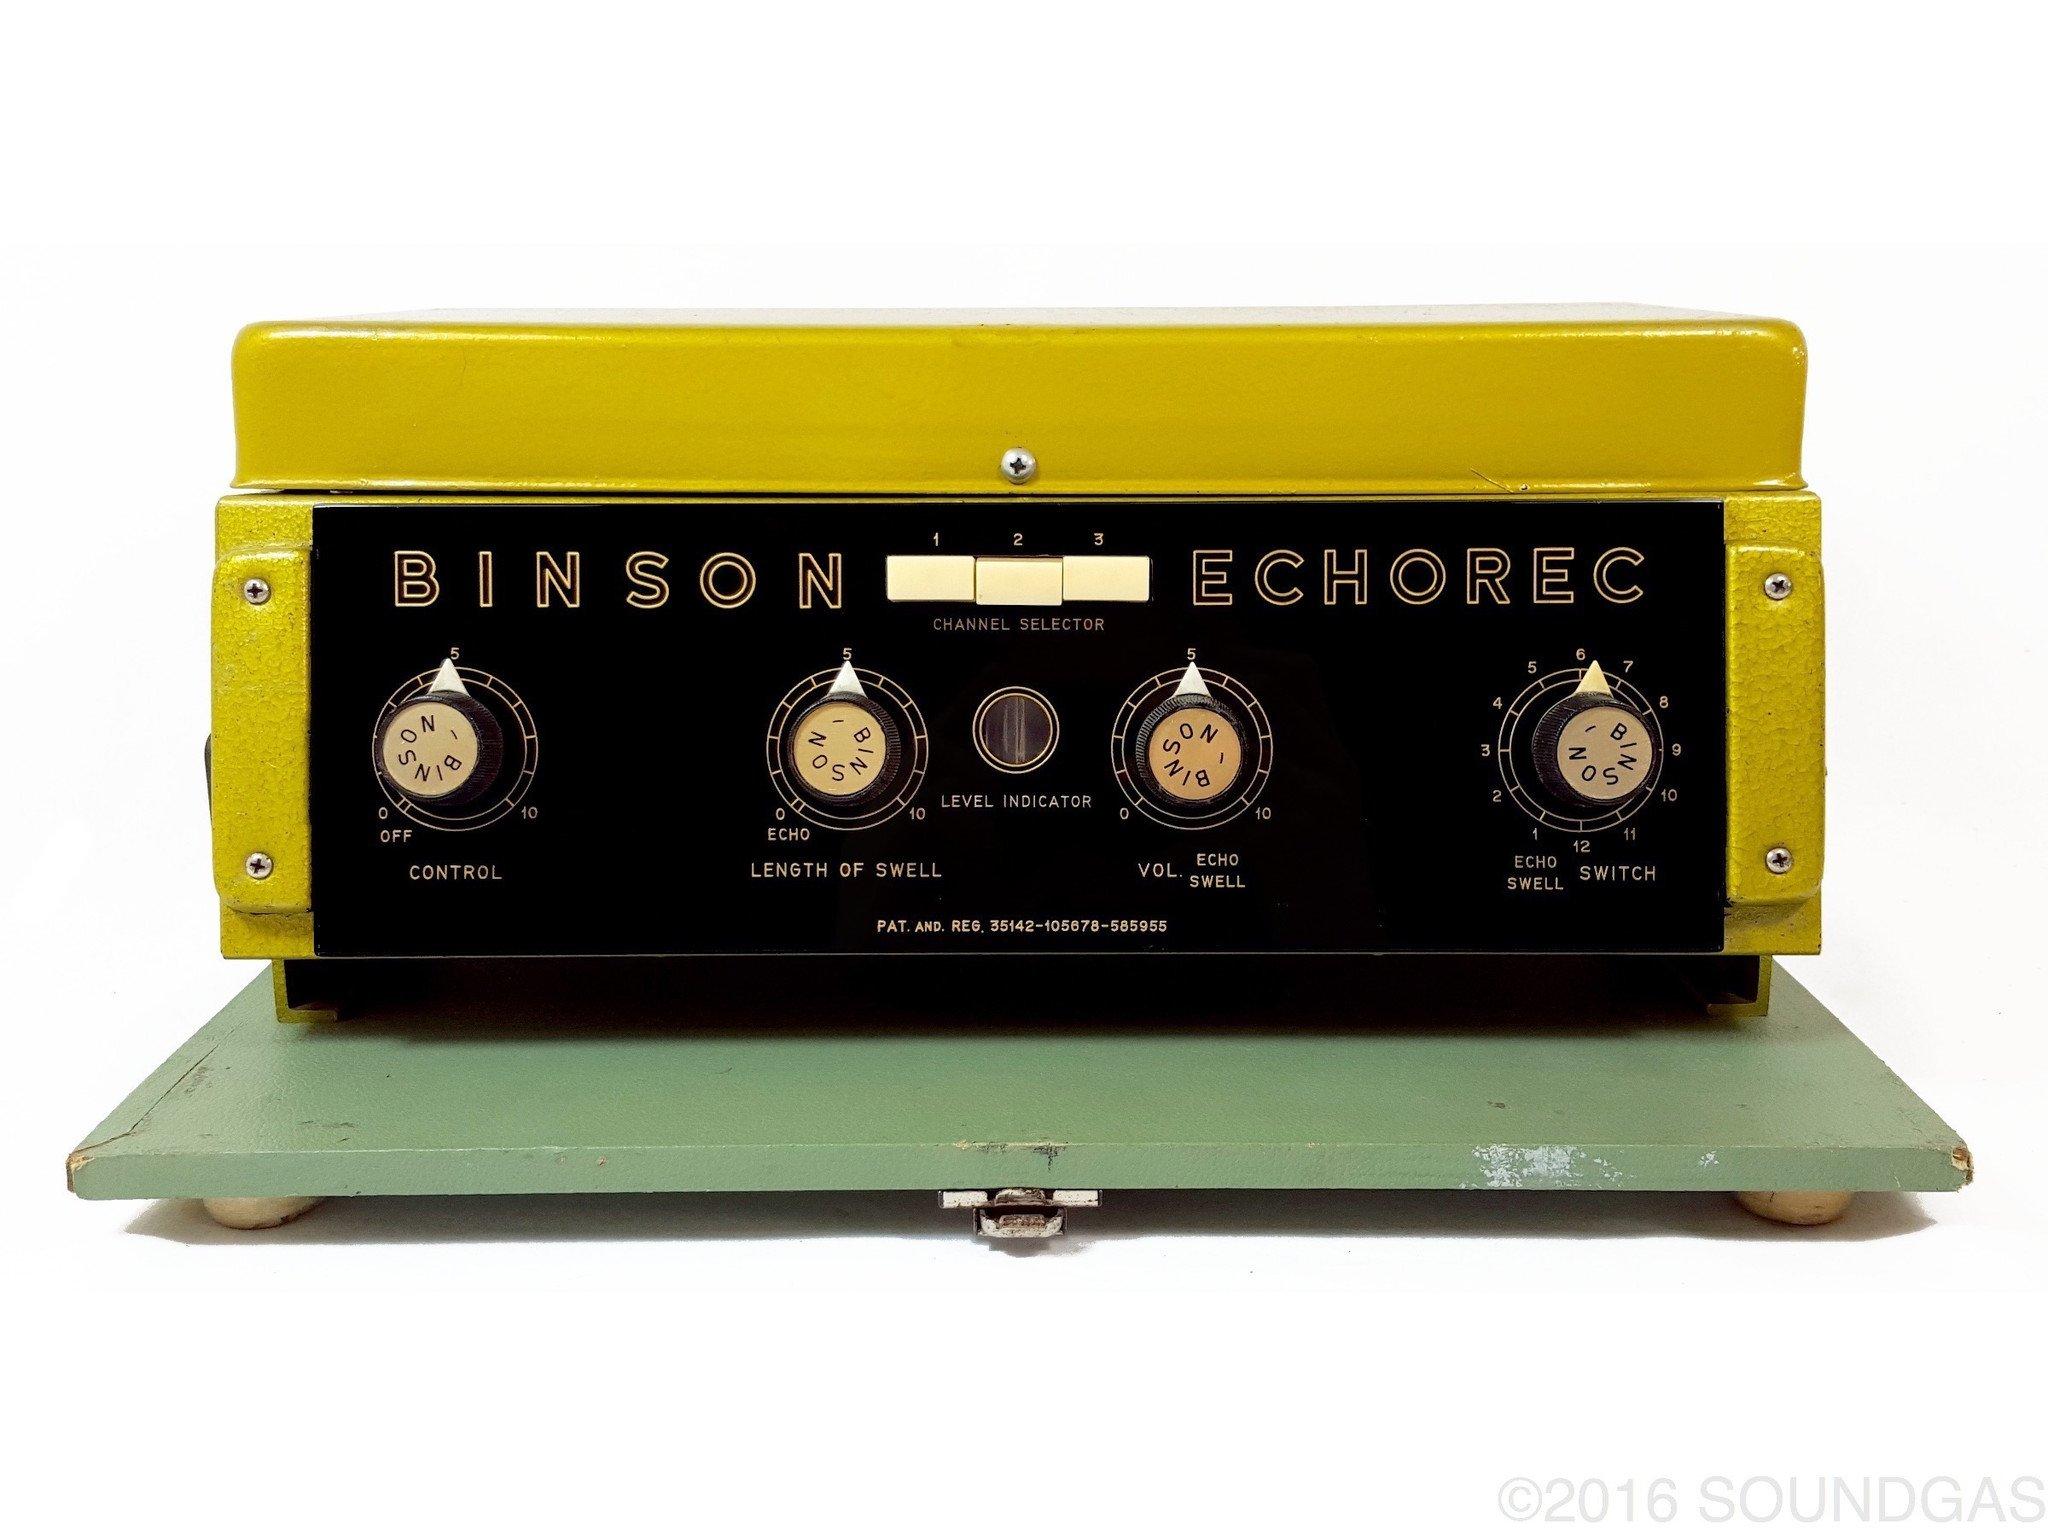 BINSON ECHOREC B2 (Baby 2) - Fully-Restored